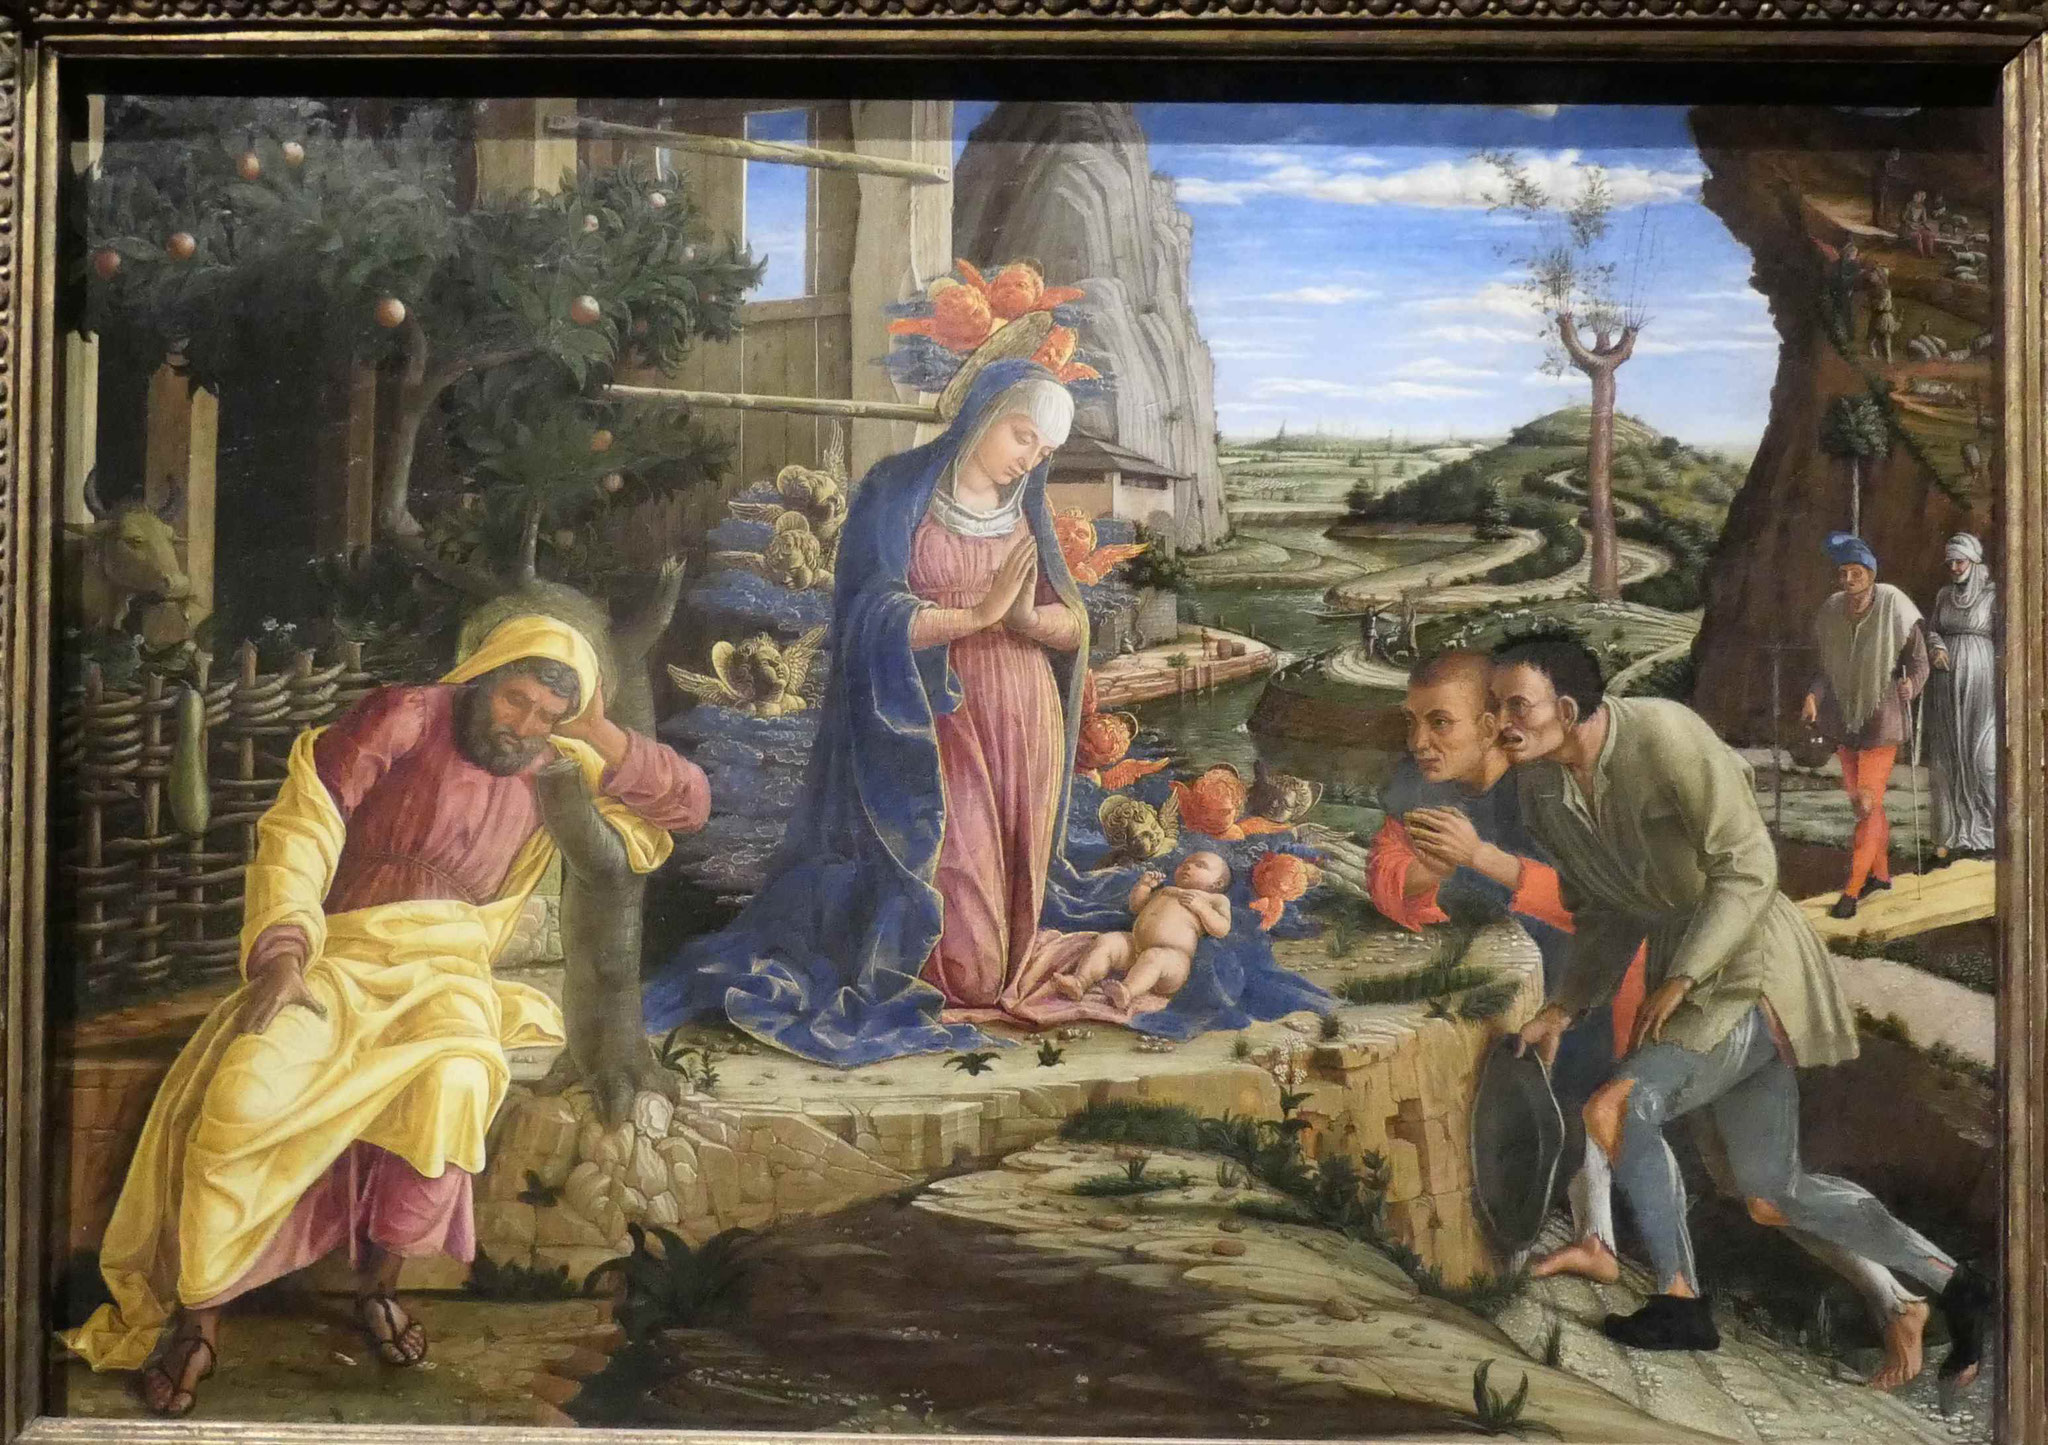 Andrea Mantegna, Die Anbetung der Hirten, um 1450/52, MoMa